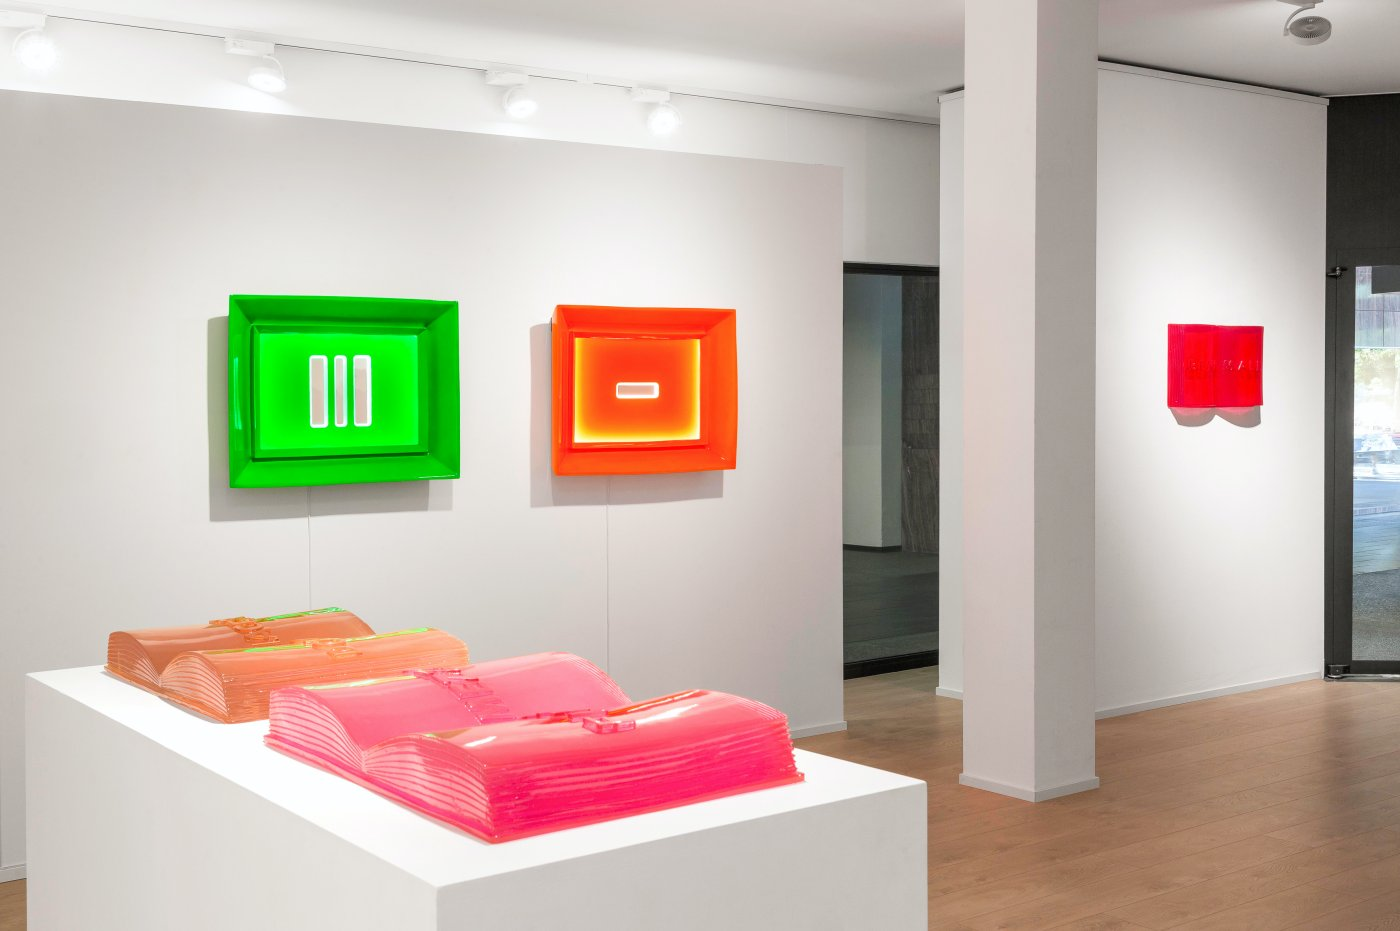 Cortesi-Gallery-Lugano-Chiara-Dynys-Installation view